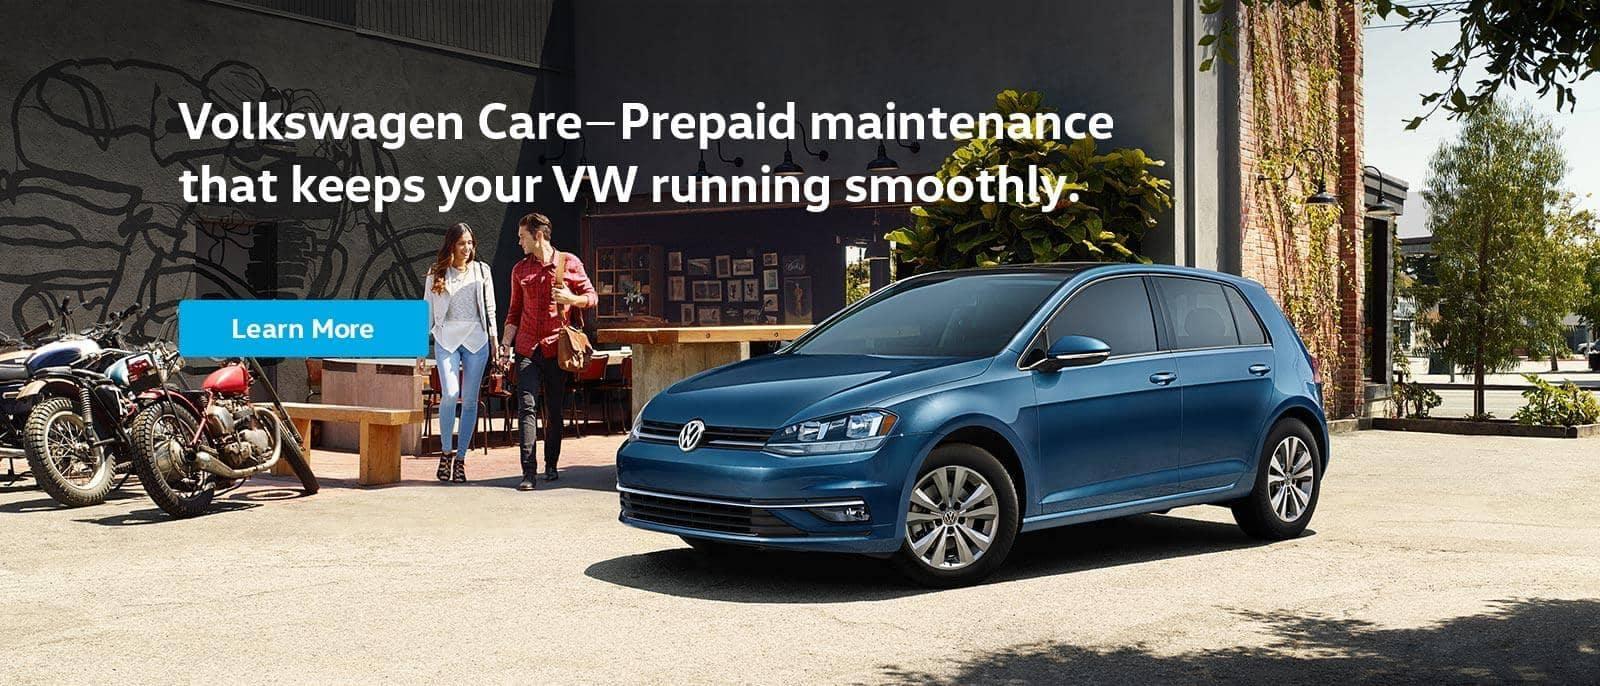 VW Care maintenance